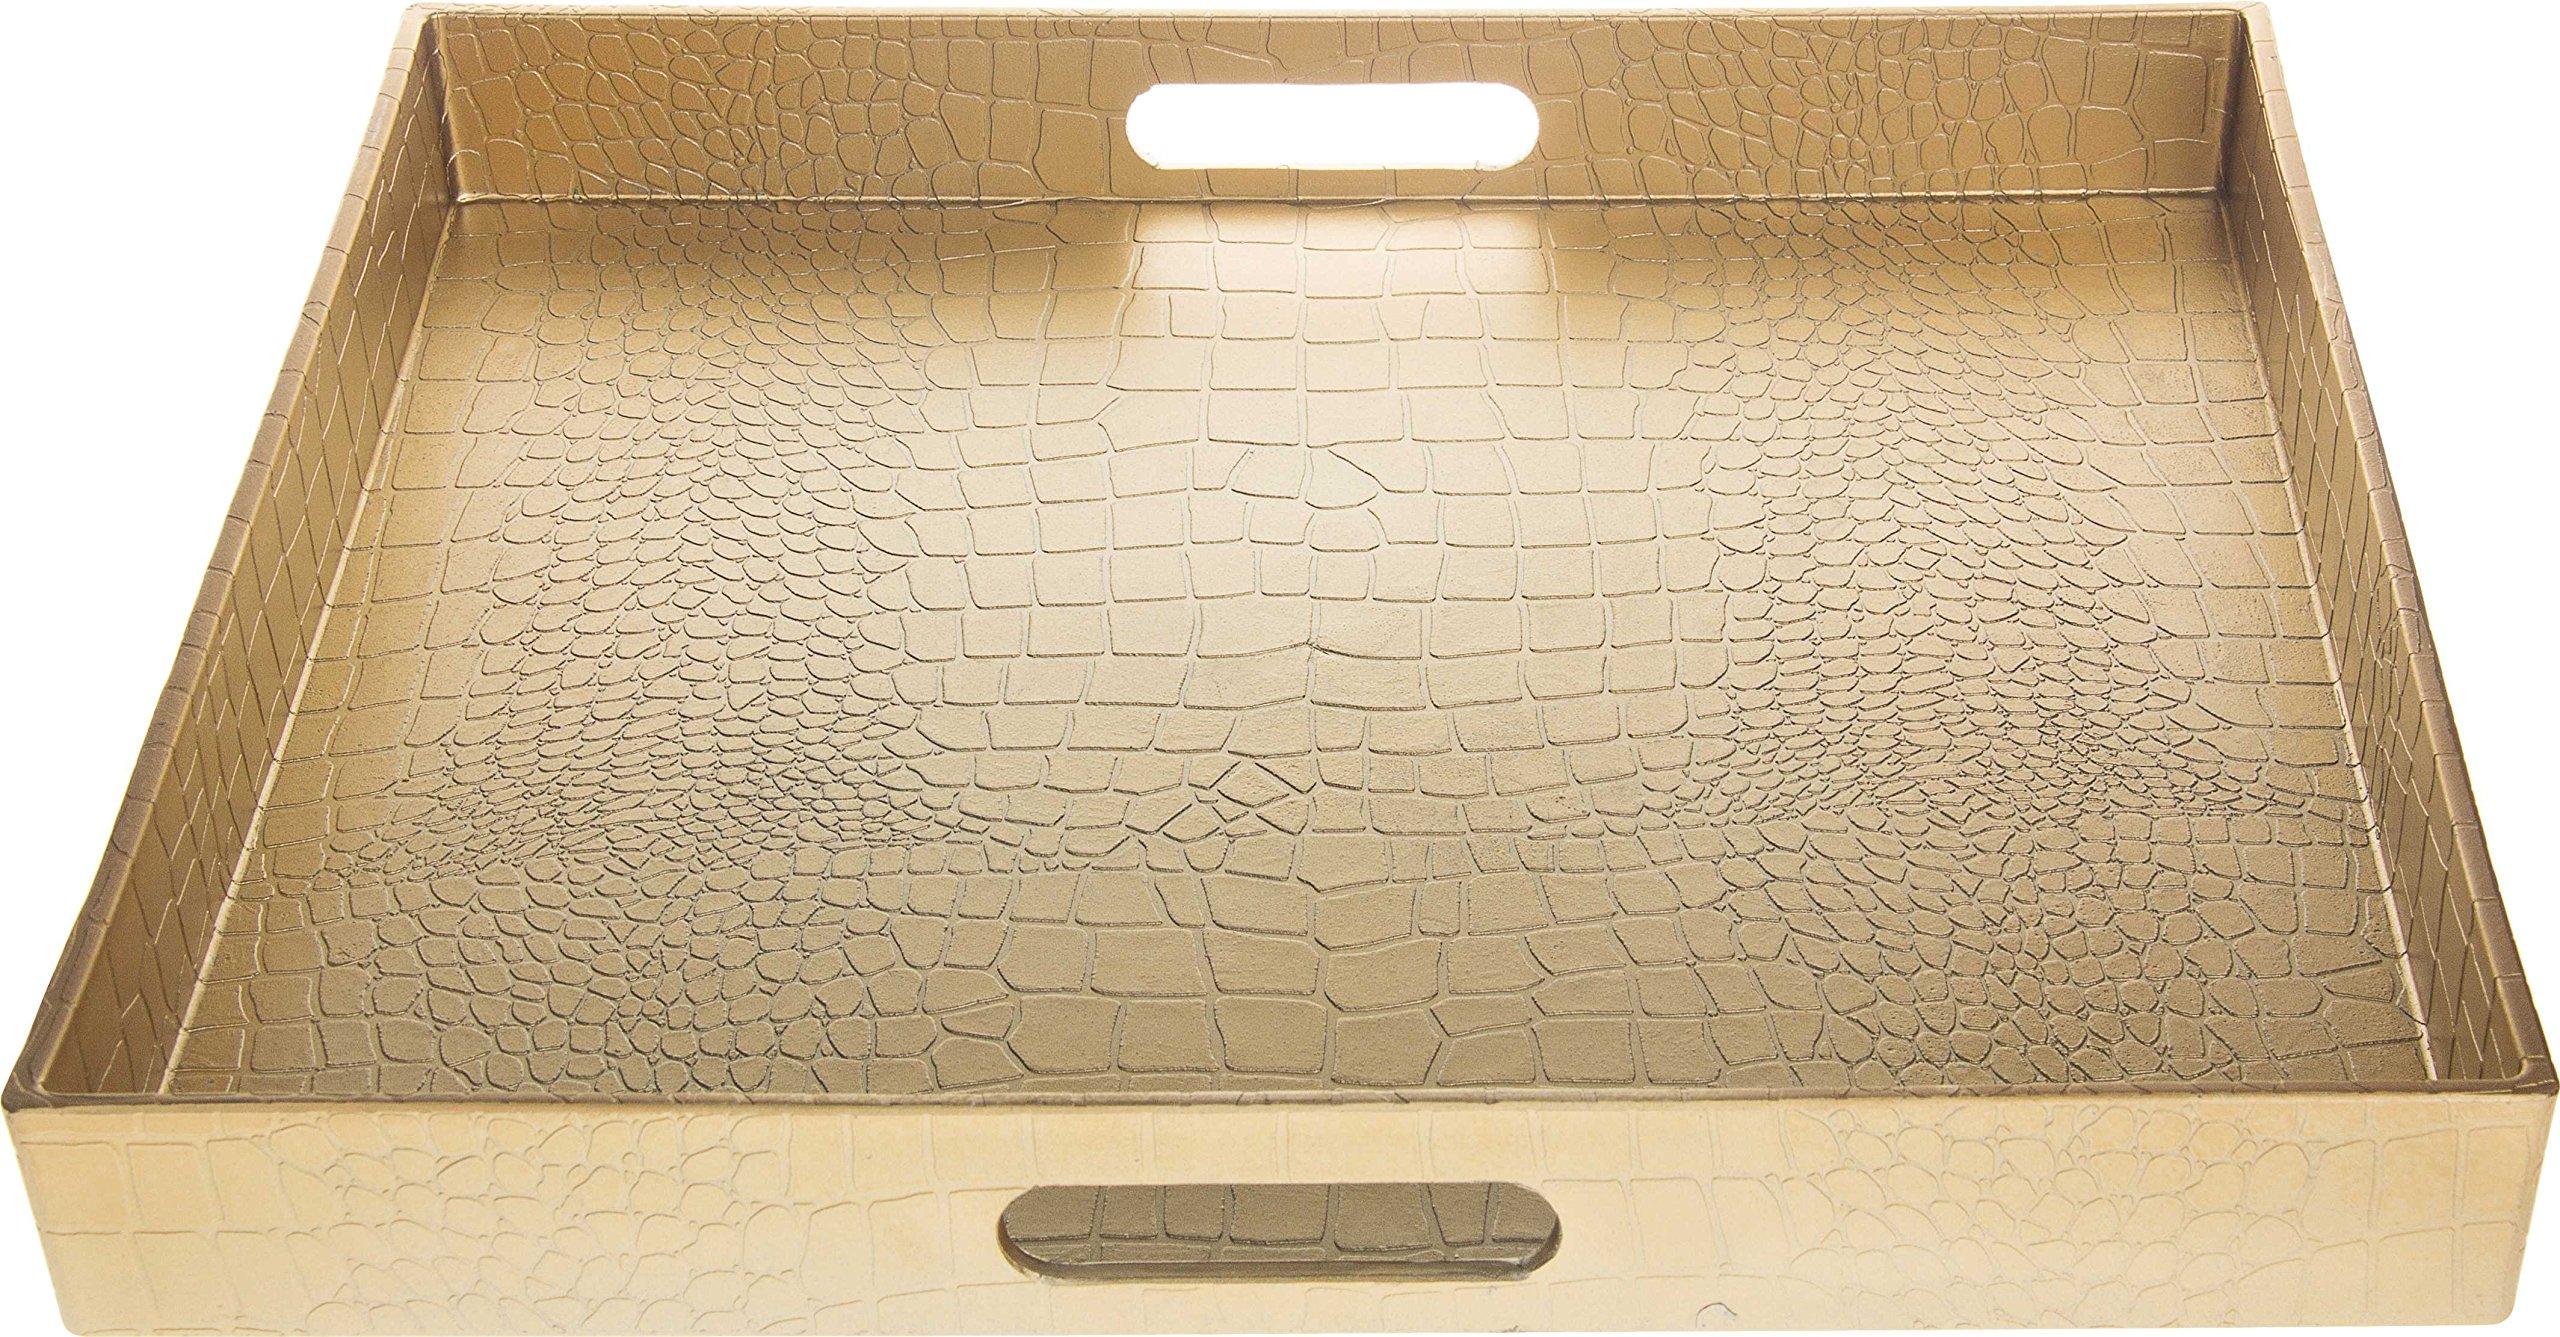 Fantastic: Square Alligator Serving Traywith Matte Finish Design (1, Square Alligator Gold)